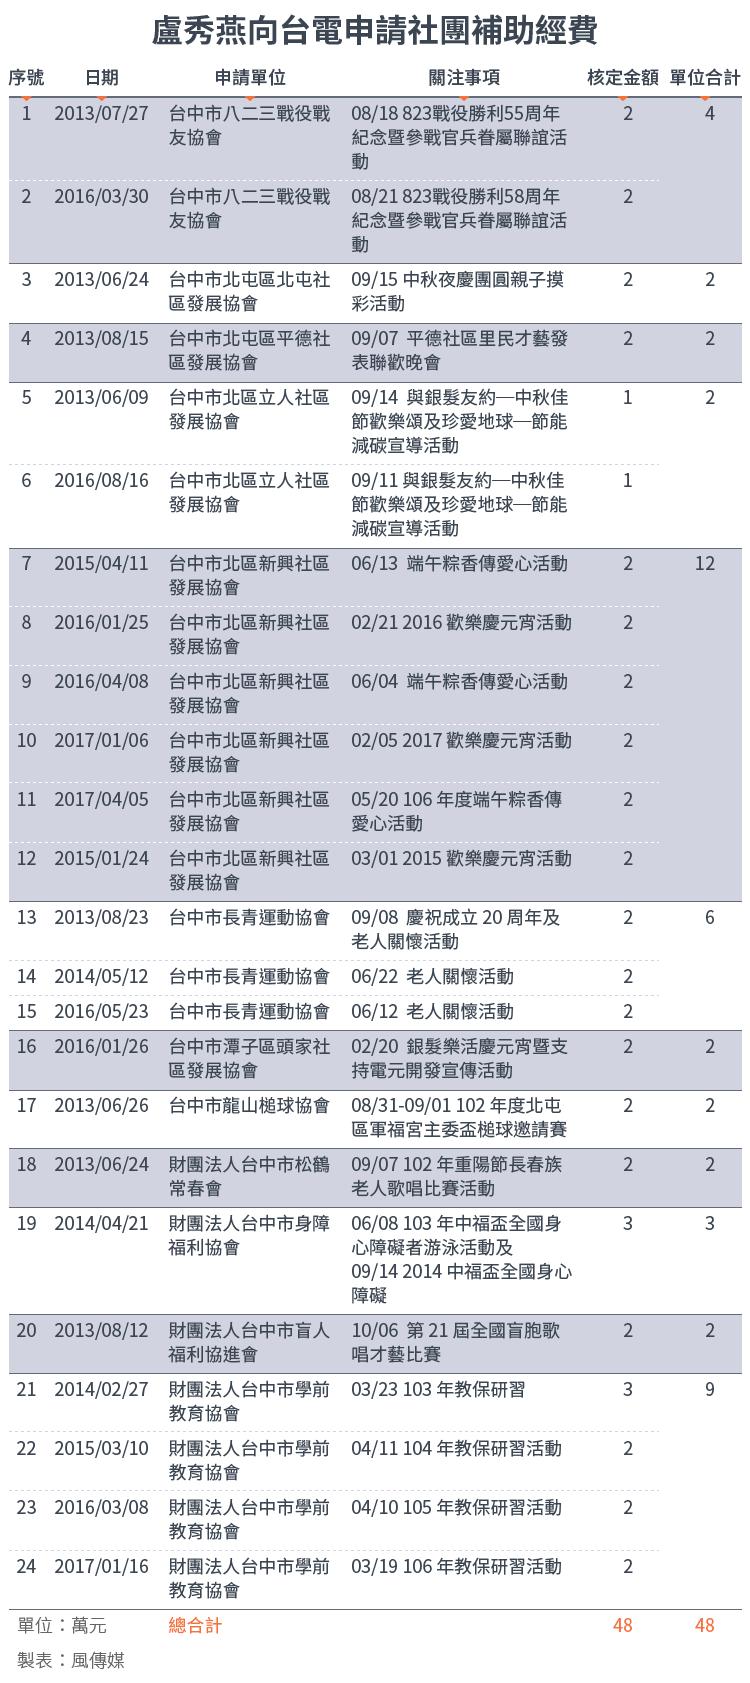 20171213-SMG0034-E03-盧秀燕向台電申請社團收視費補助經費_工作區域 1.png